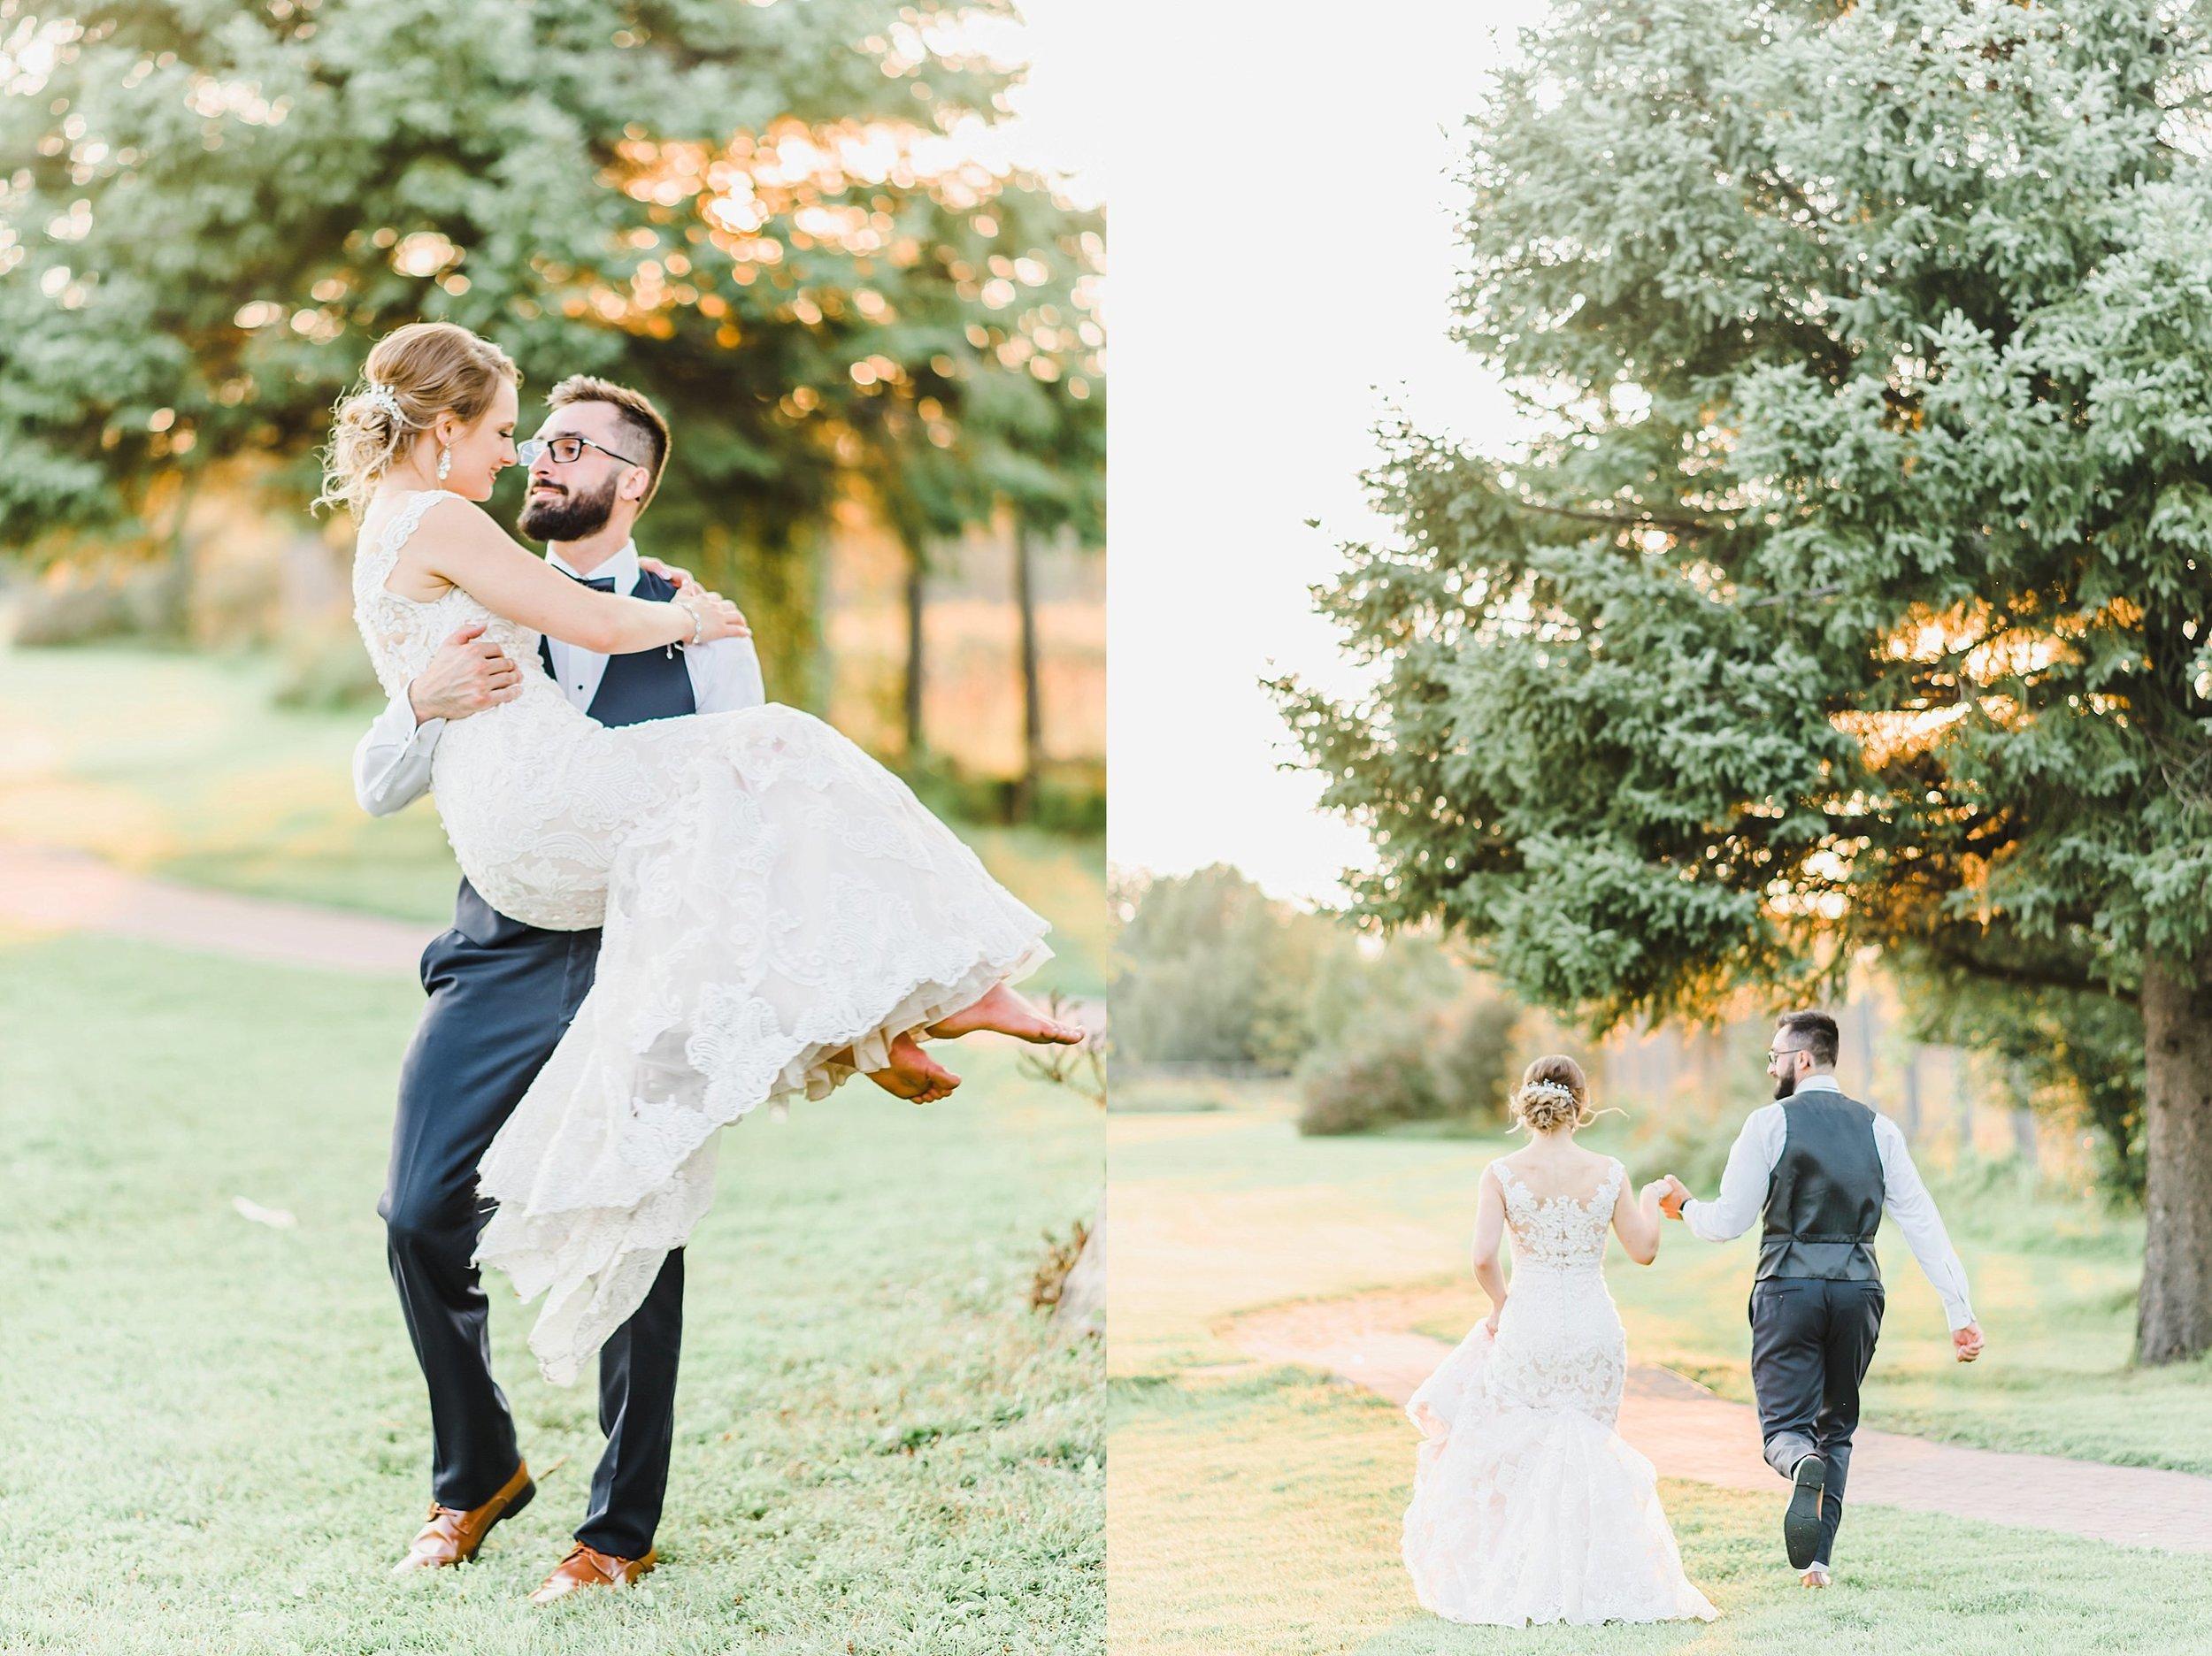 light airy indie fine art ottawa wedding photographer | Ali and Batoul Photography_1348.jpg